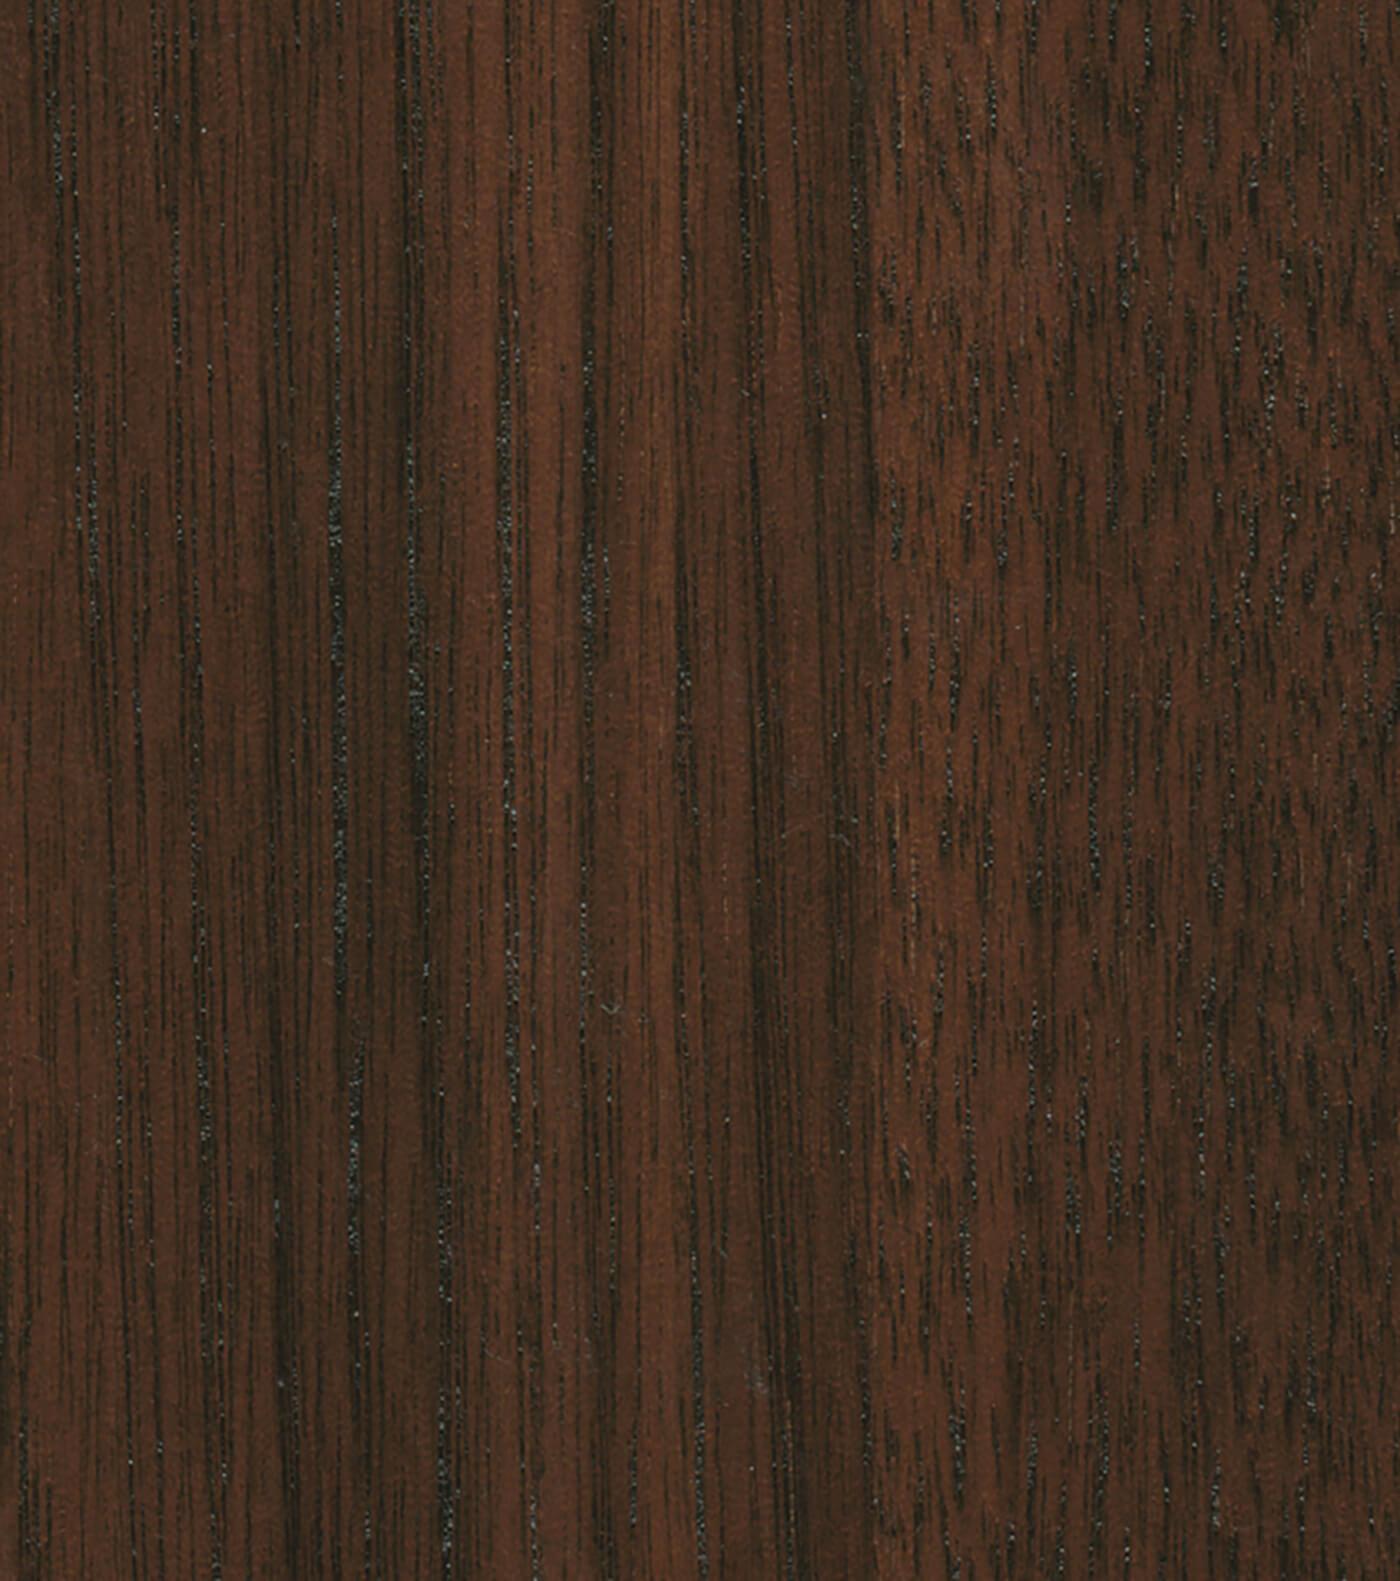 Hazelnut - Walnut Exotic Veneer